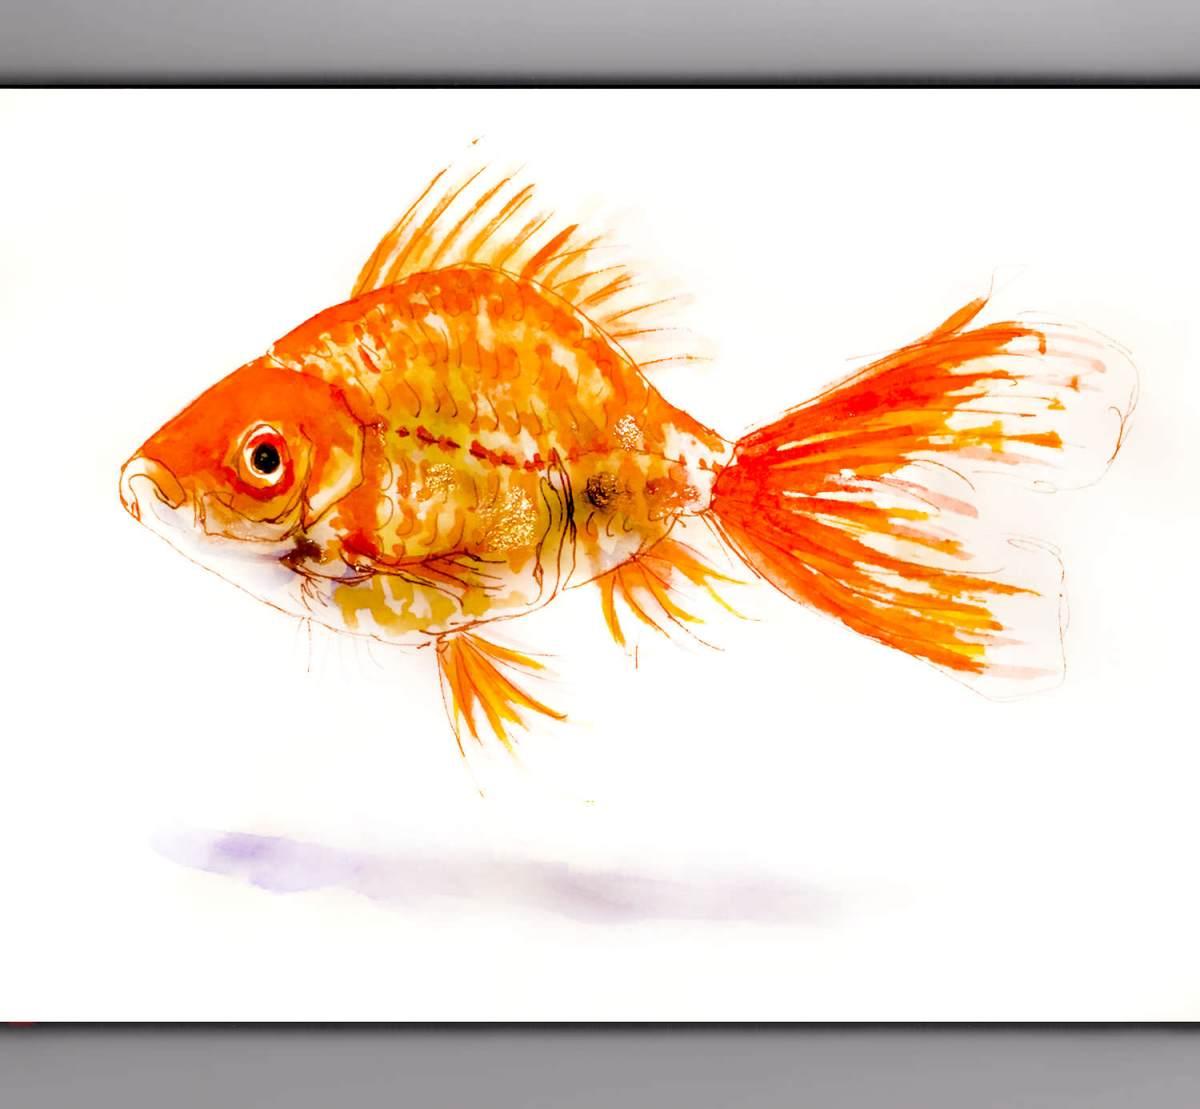 #WorldWatercolorGroup - Day 24 - My Favorite Fish - Goldfish